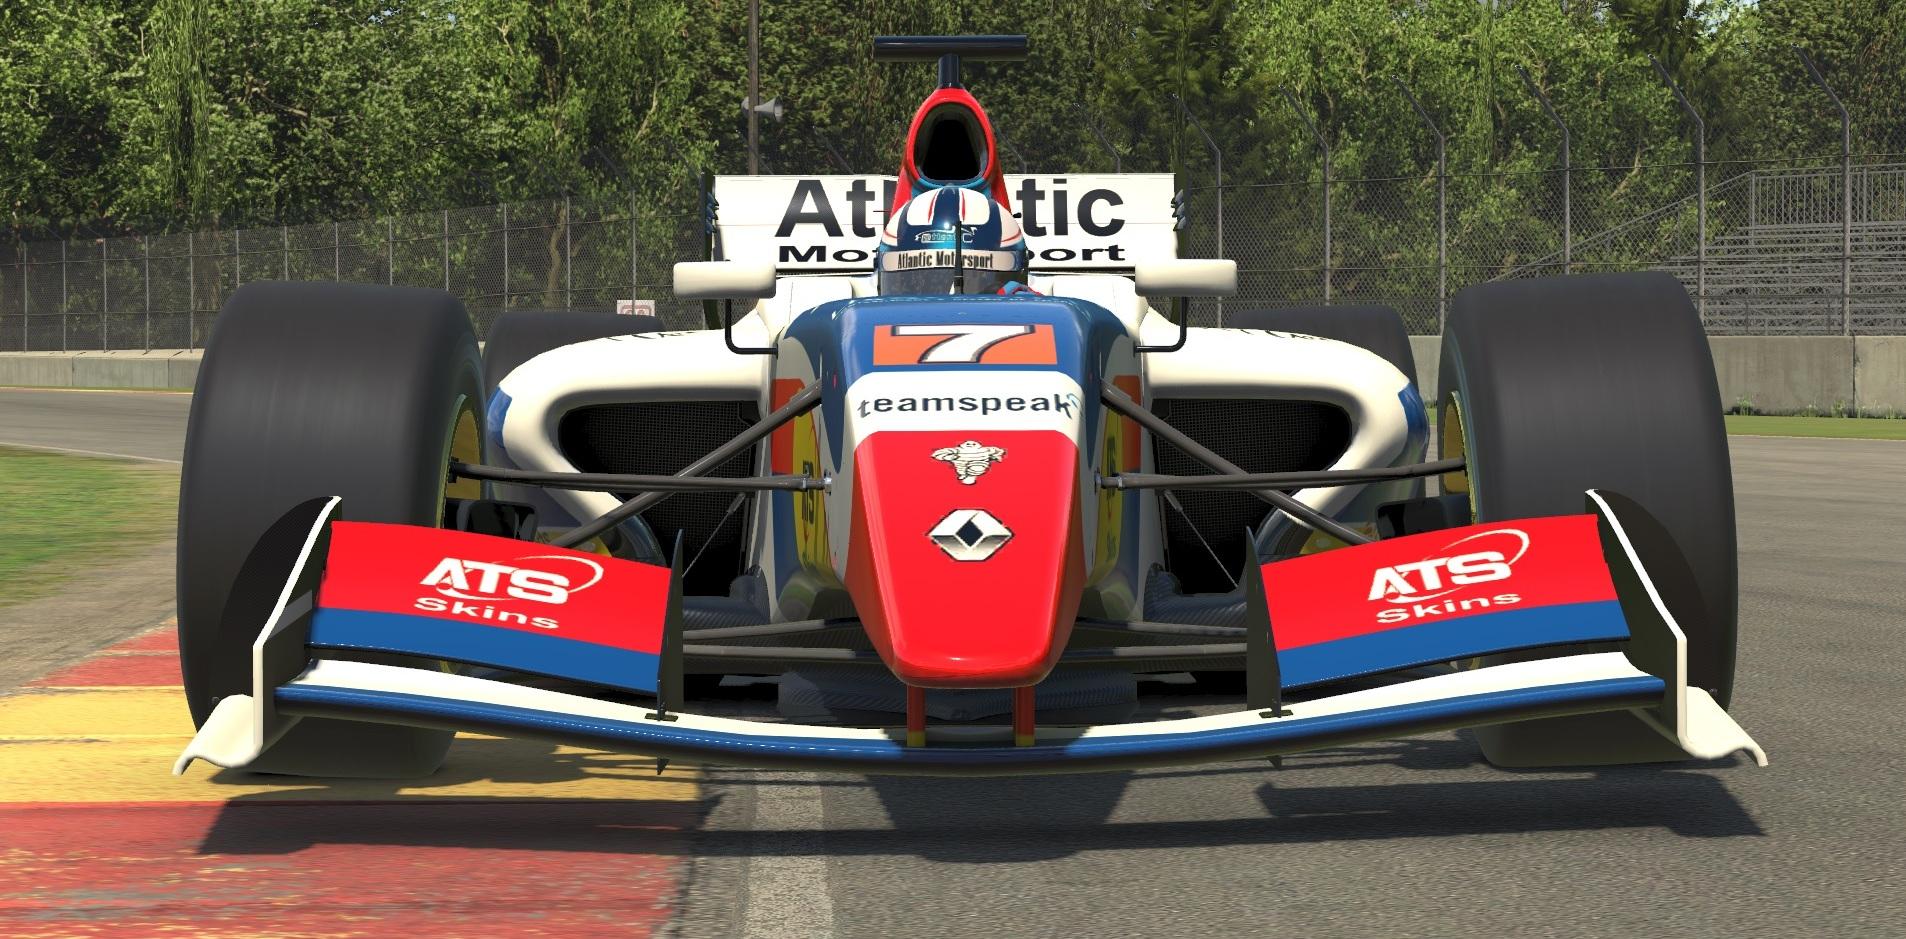 Atlantic Motorsport presents the new Formula Renault 3_5 for iRacing